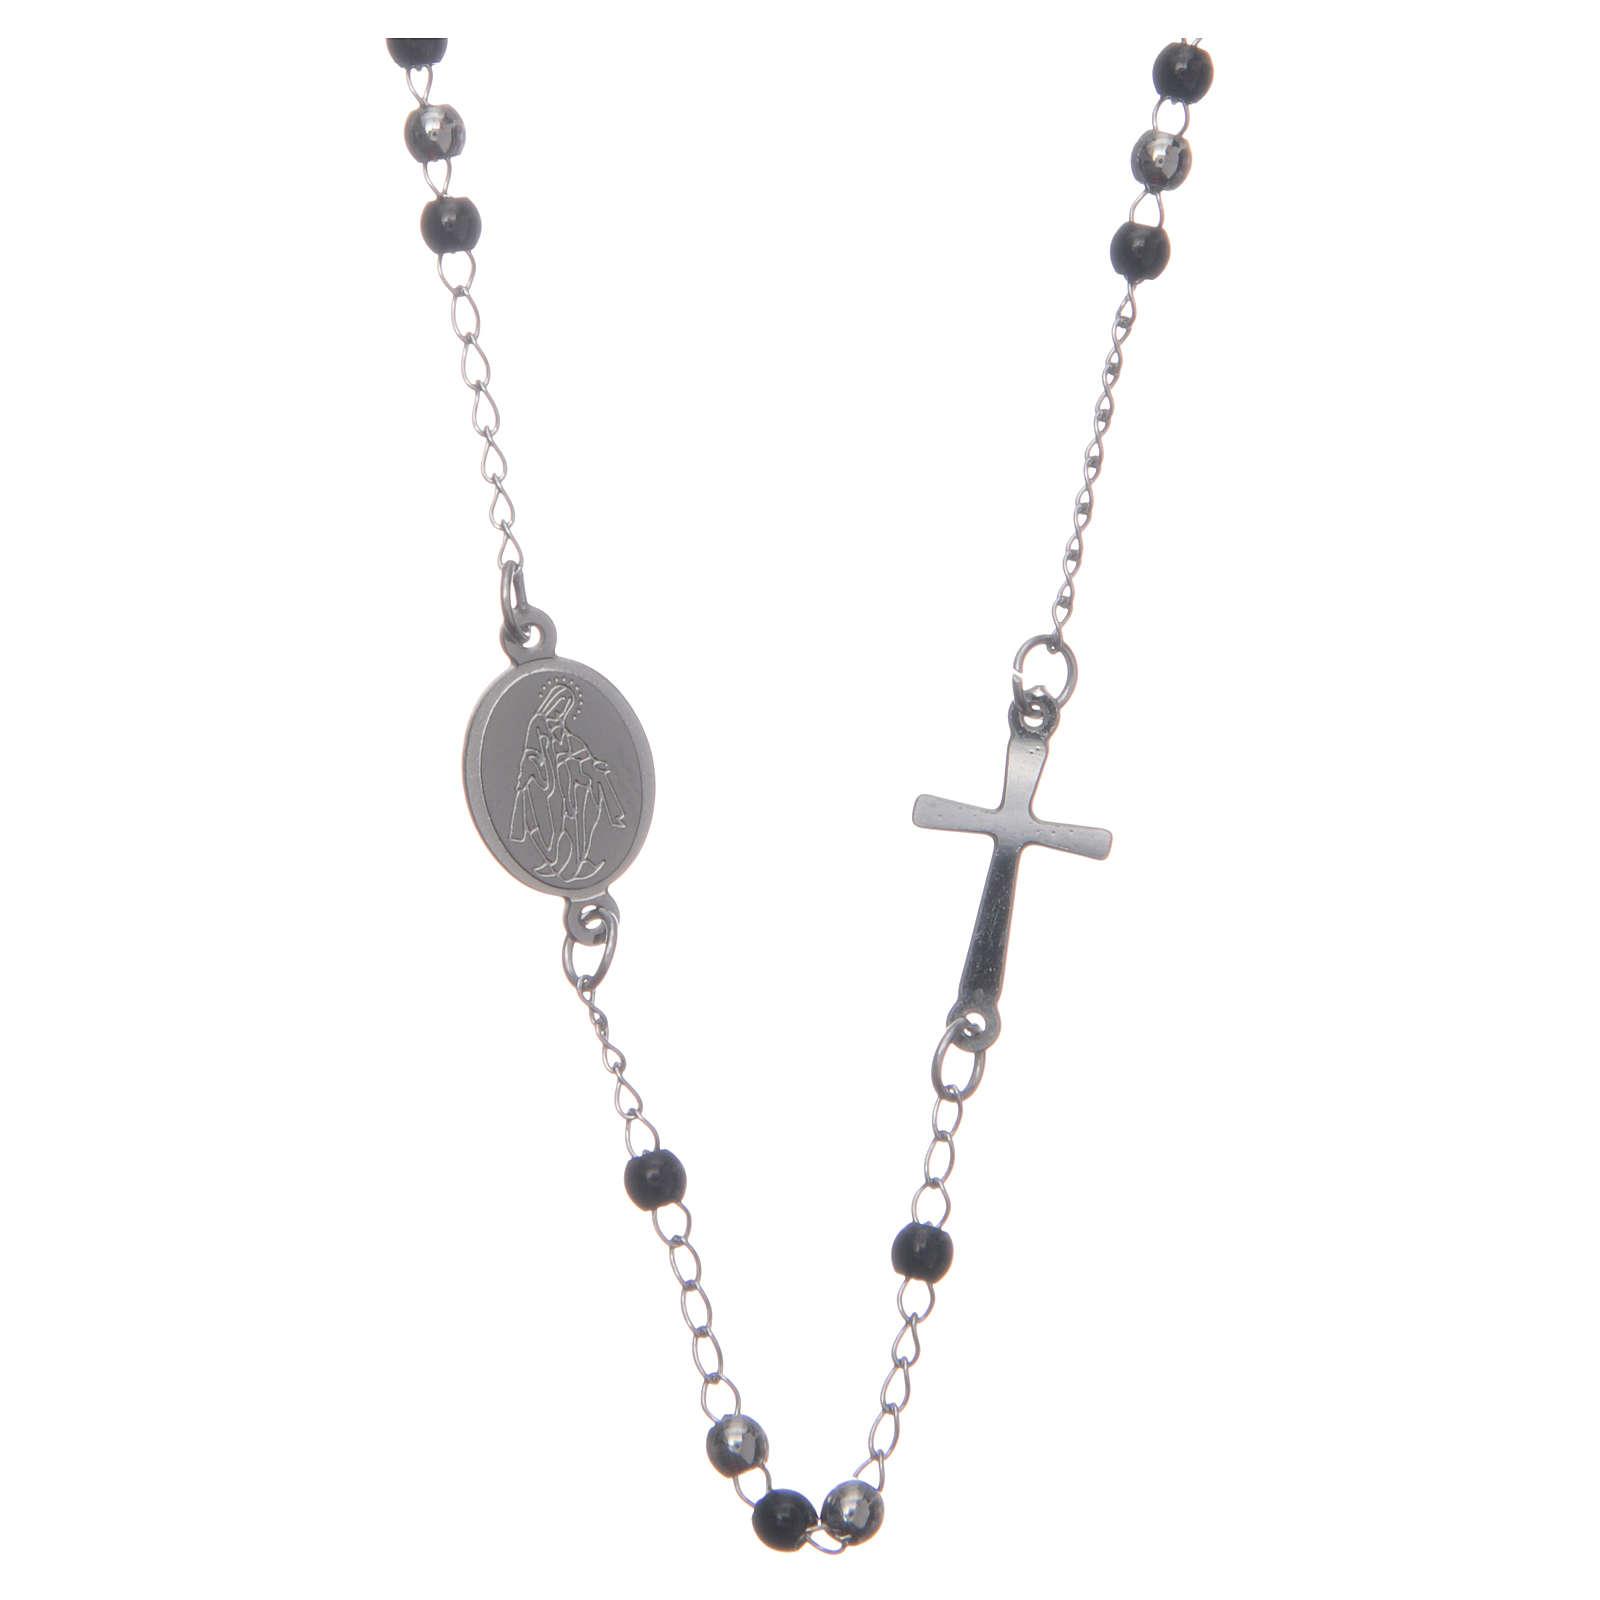 Rosario girocollo silver nero acciaio 316L 4